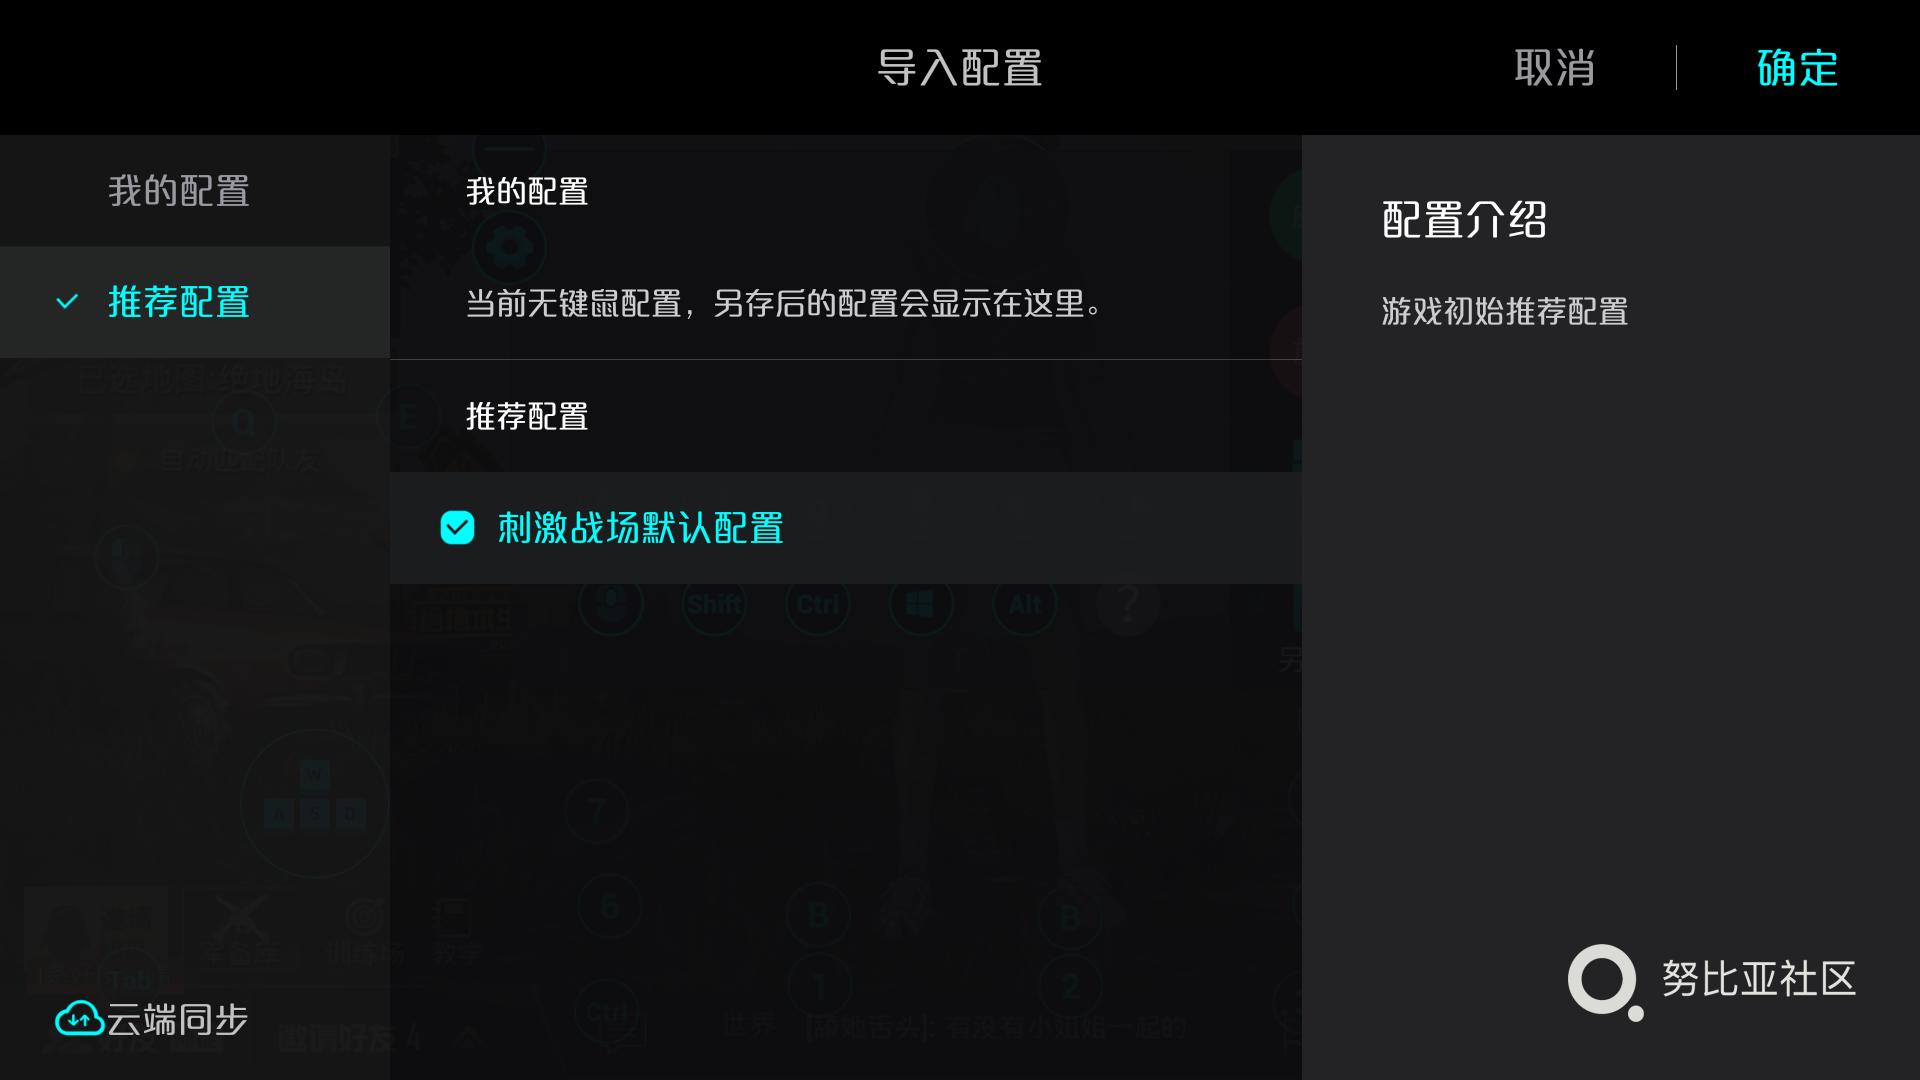 Screenshot_2018-06-09-13-03-42.png